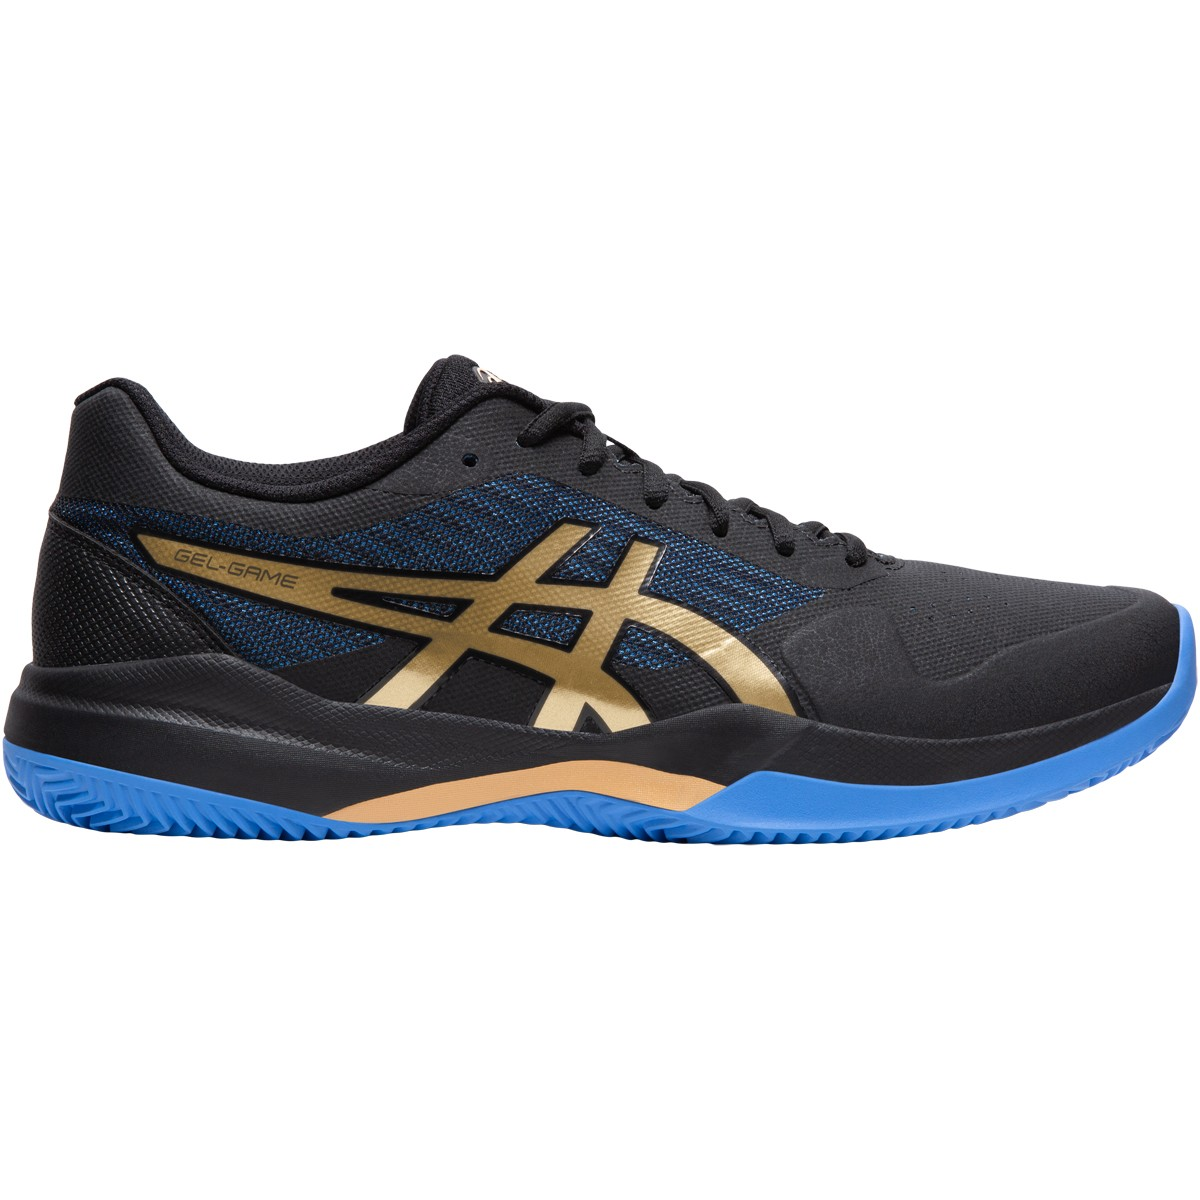 ASICS GEL GAME 7 CLAY COURT SHOES - ASICS - Men's - Shoes | Tennispro